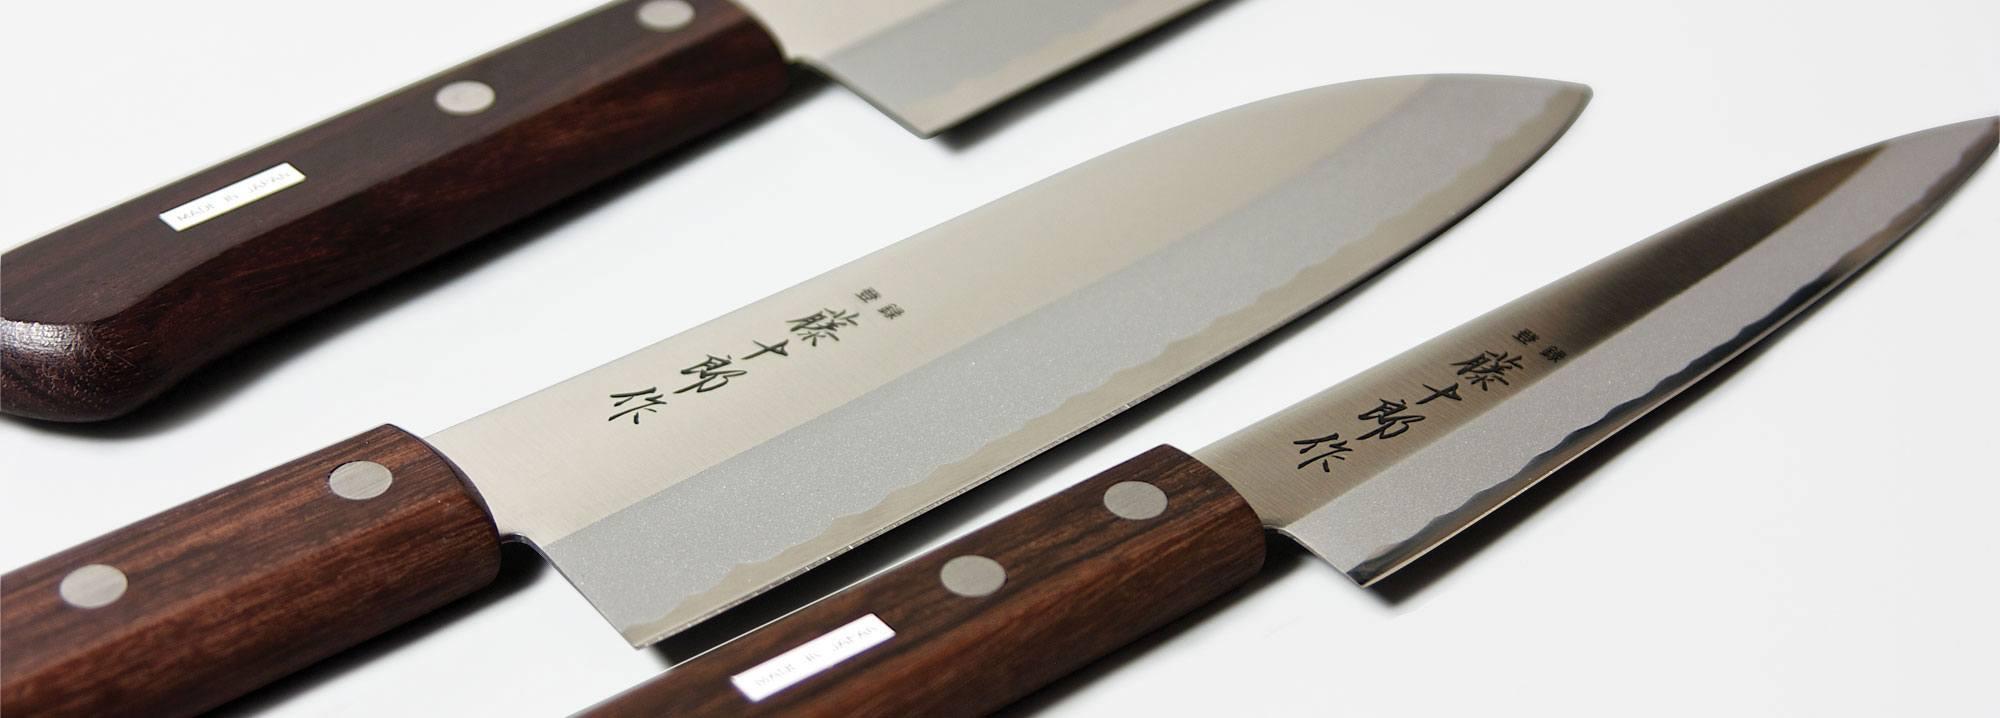 Japanese Knives   Yanagi - Deba - Usuba   Imported from Japan by Miya